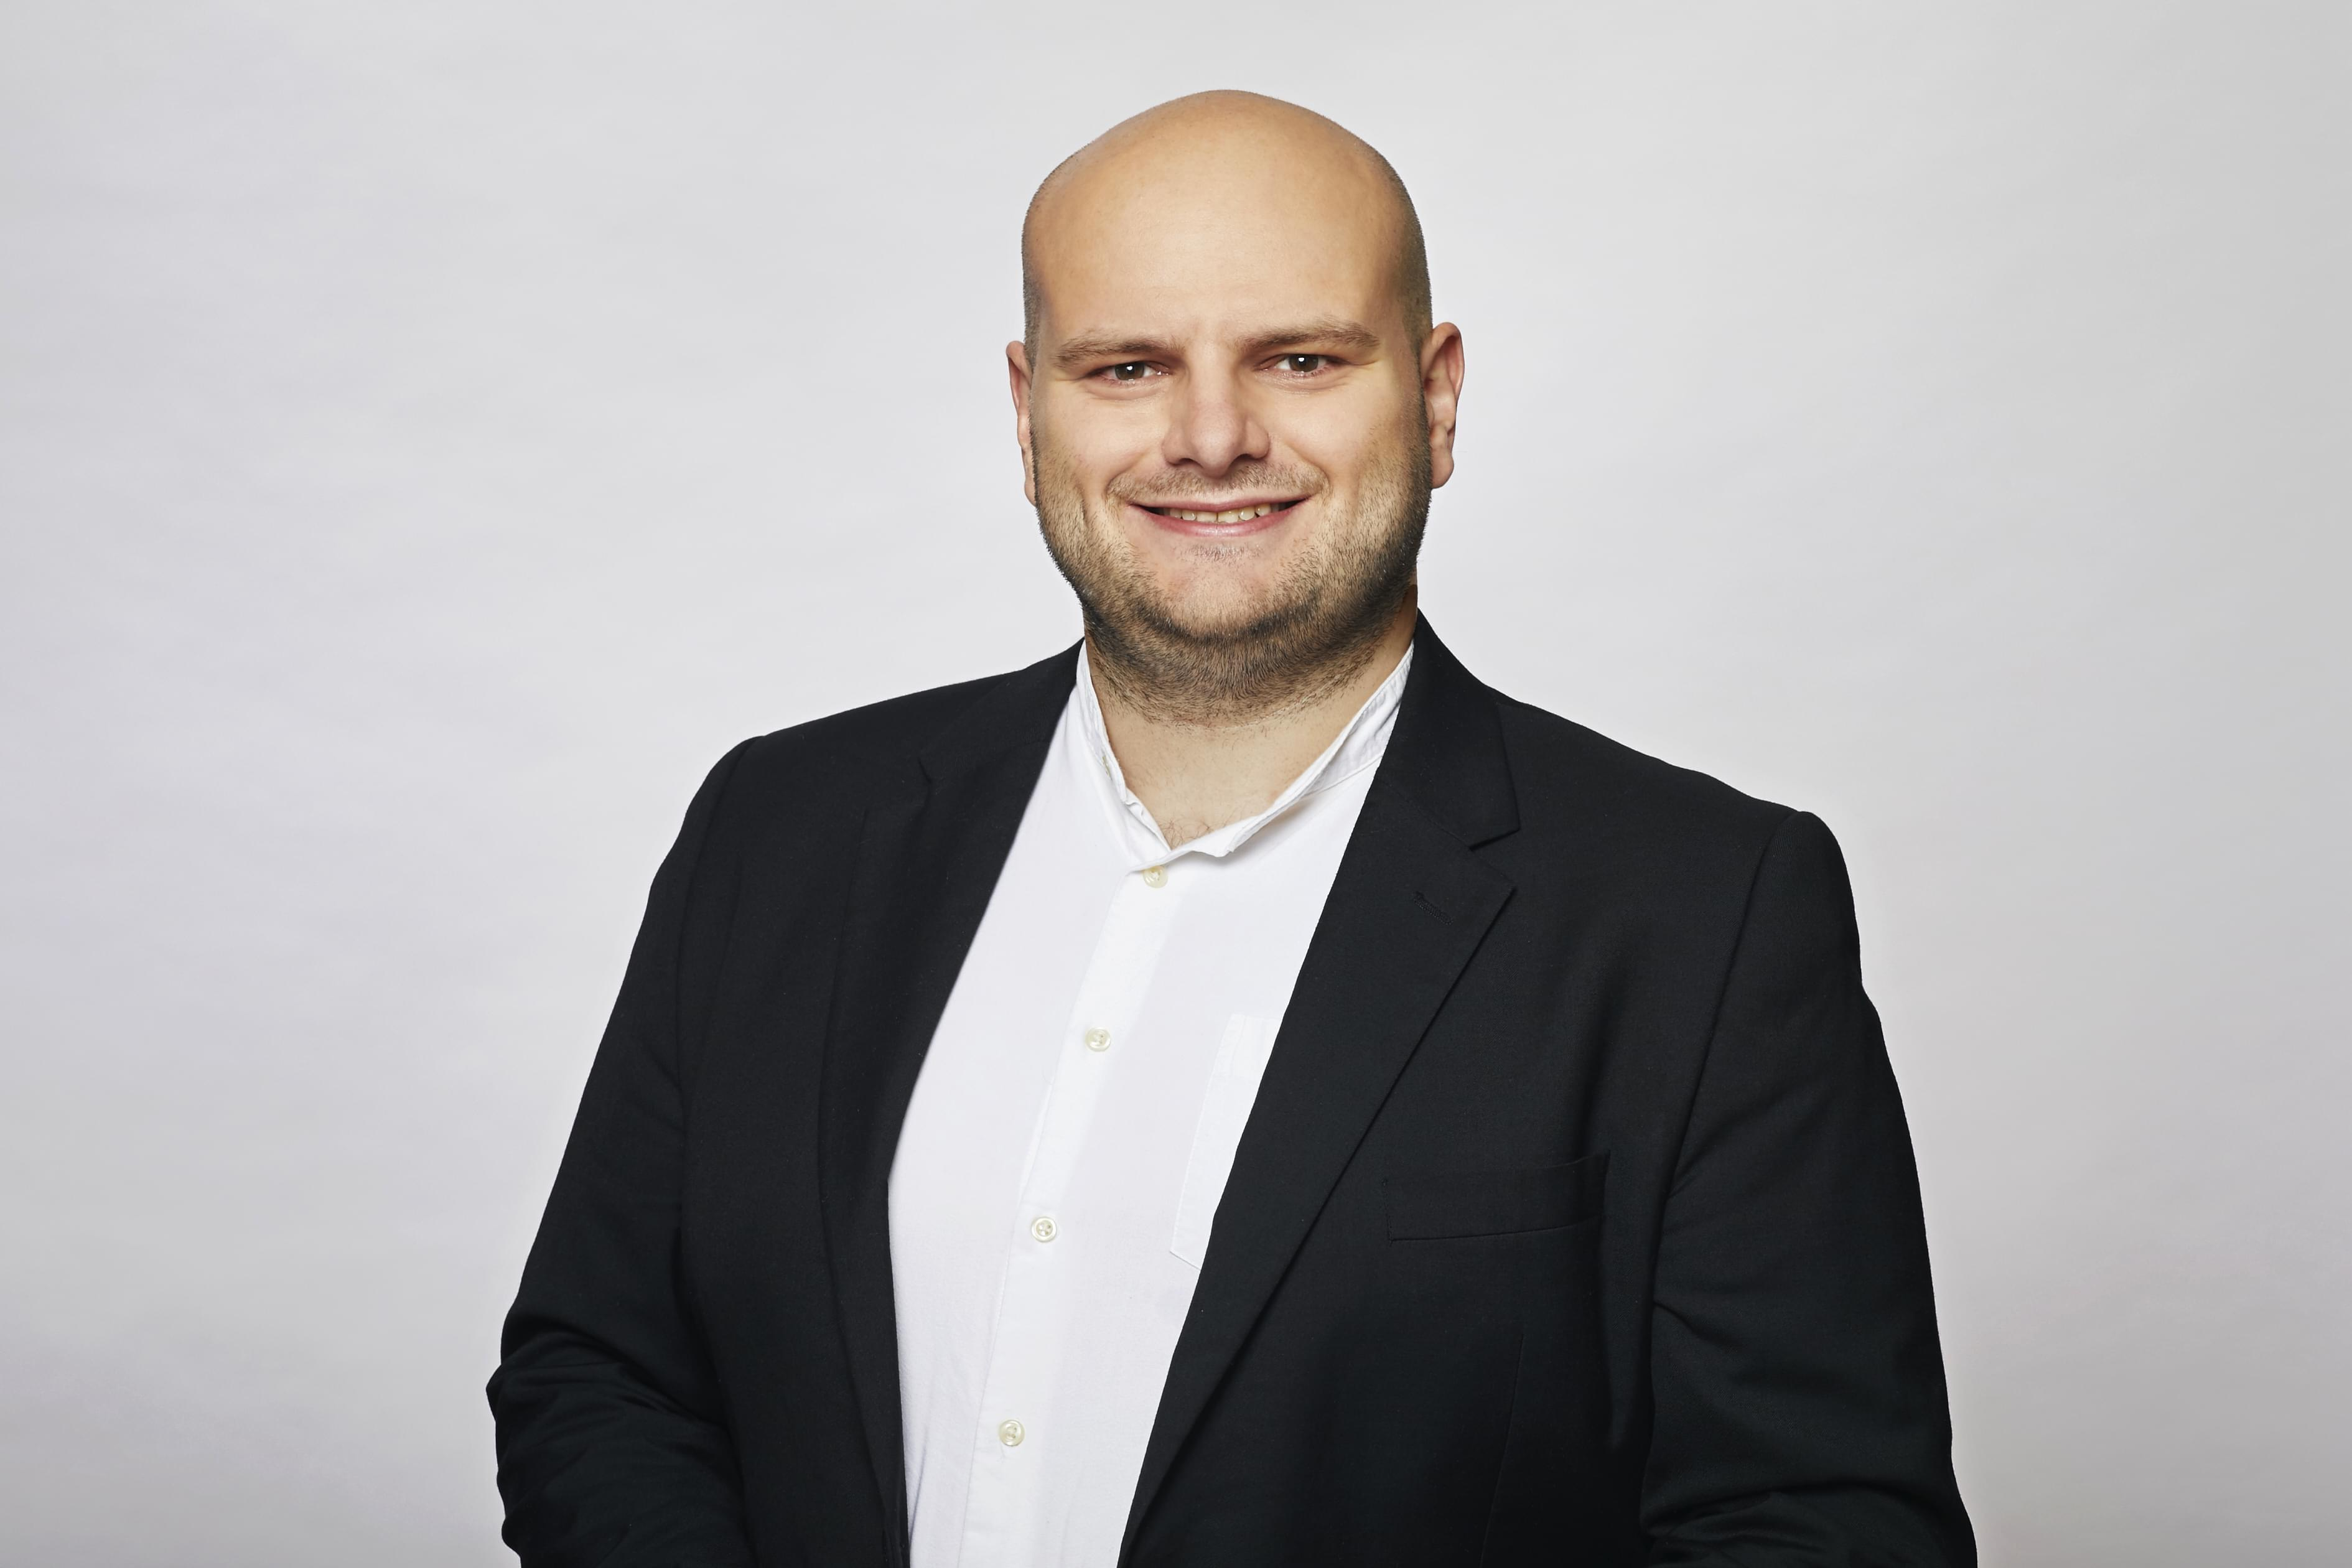 Magnus Schult, PLÜCOM DIGITAL